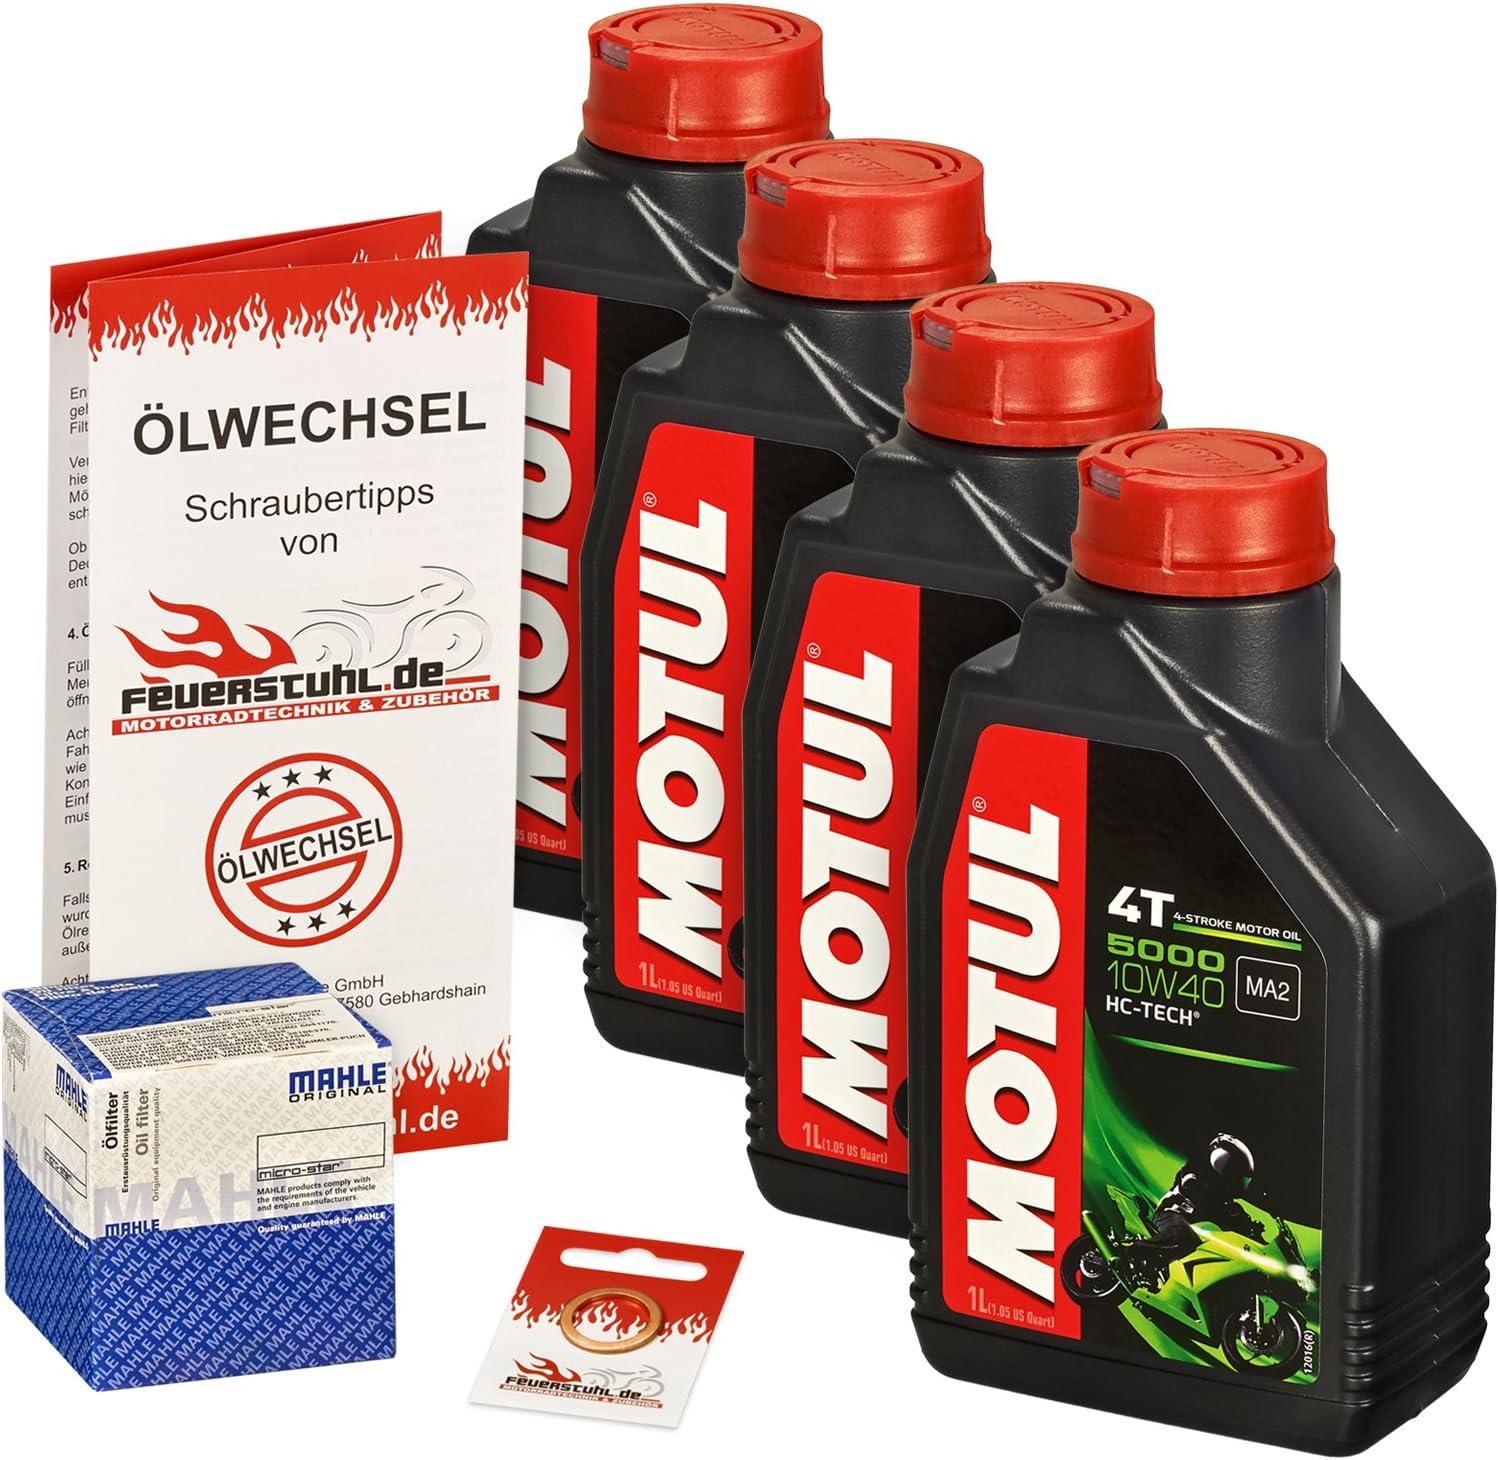 Motul 10w 40 Öl Mahle Ölfilter Für Suzuki Gsx S 1000 F 15 16 Dg Ölwechselset Inkl Motoröl Filter Dichtring Auto